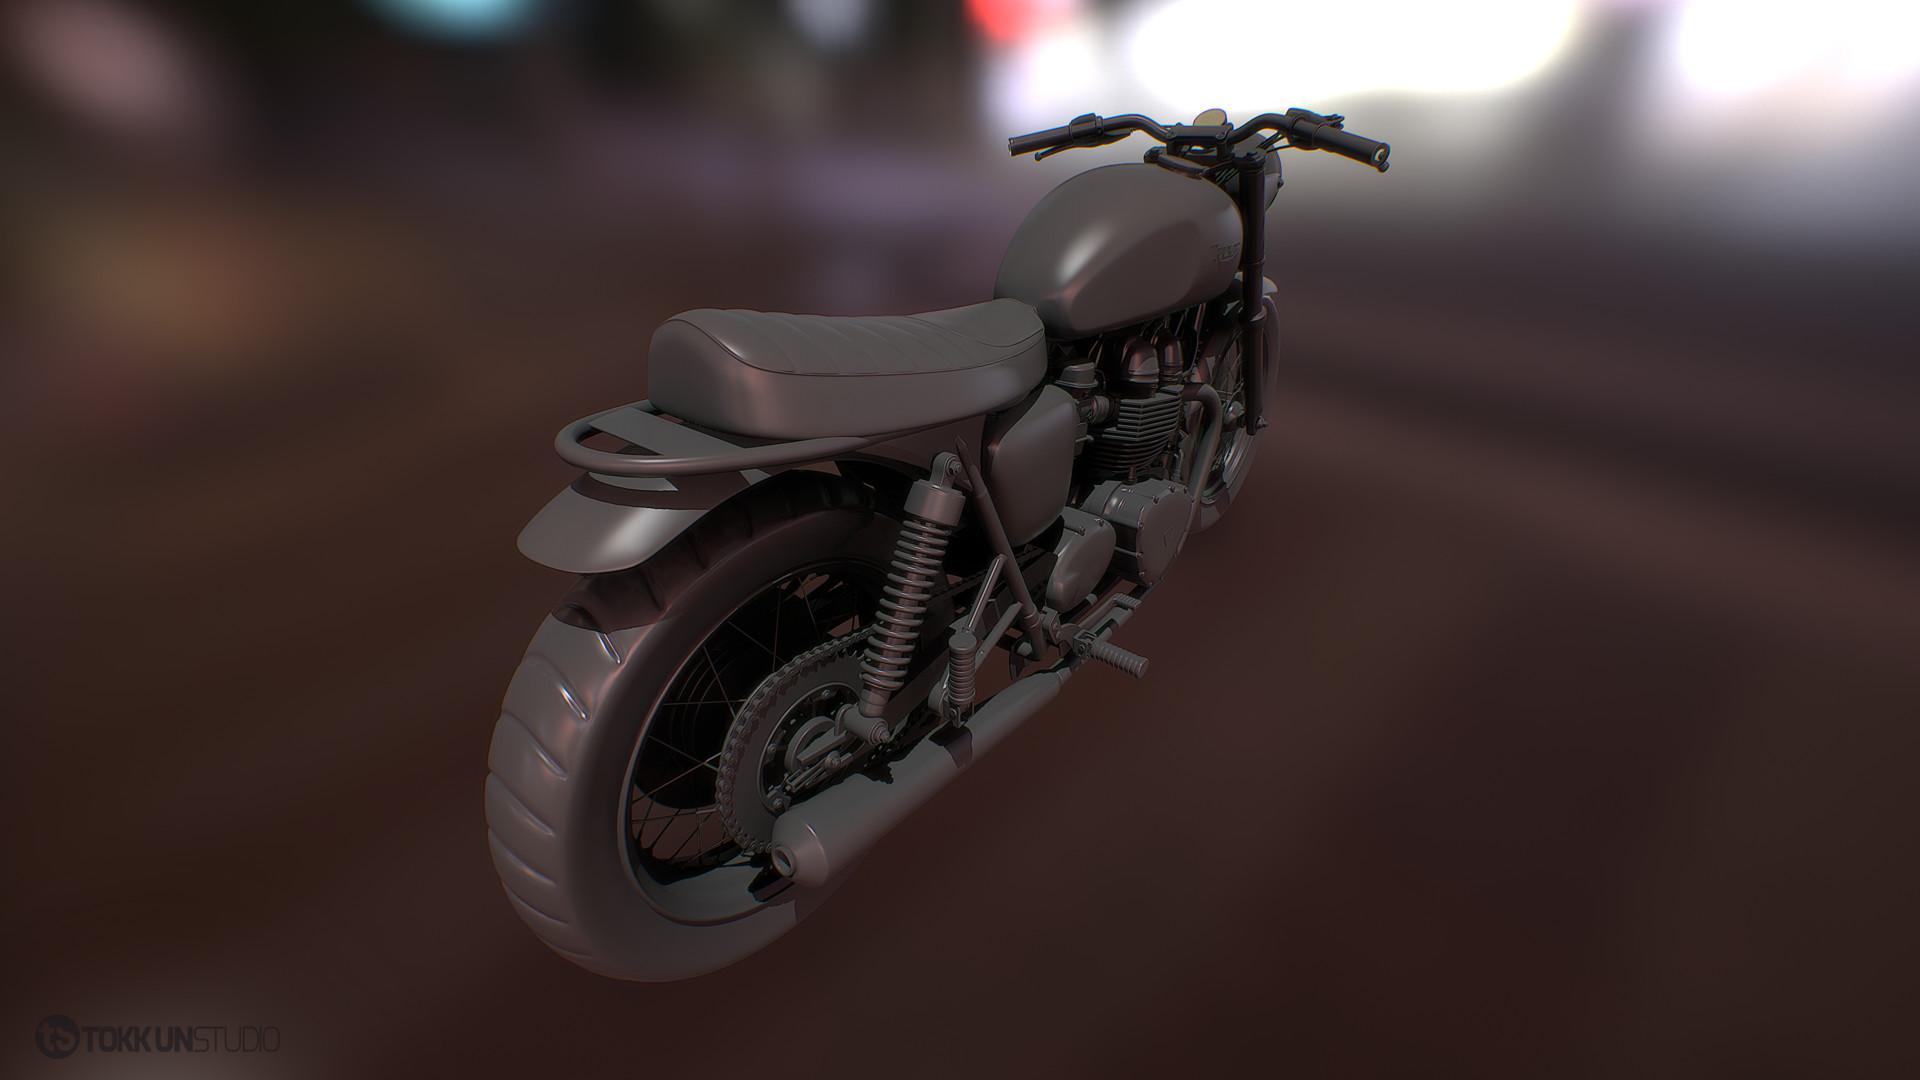 Tokkun studio bike 3ts